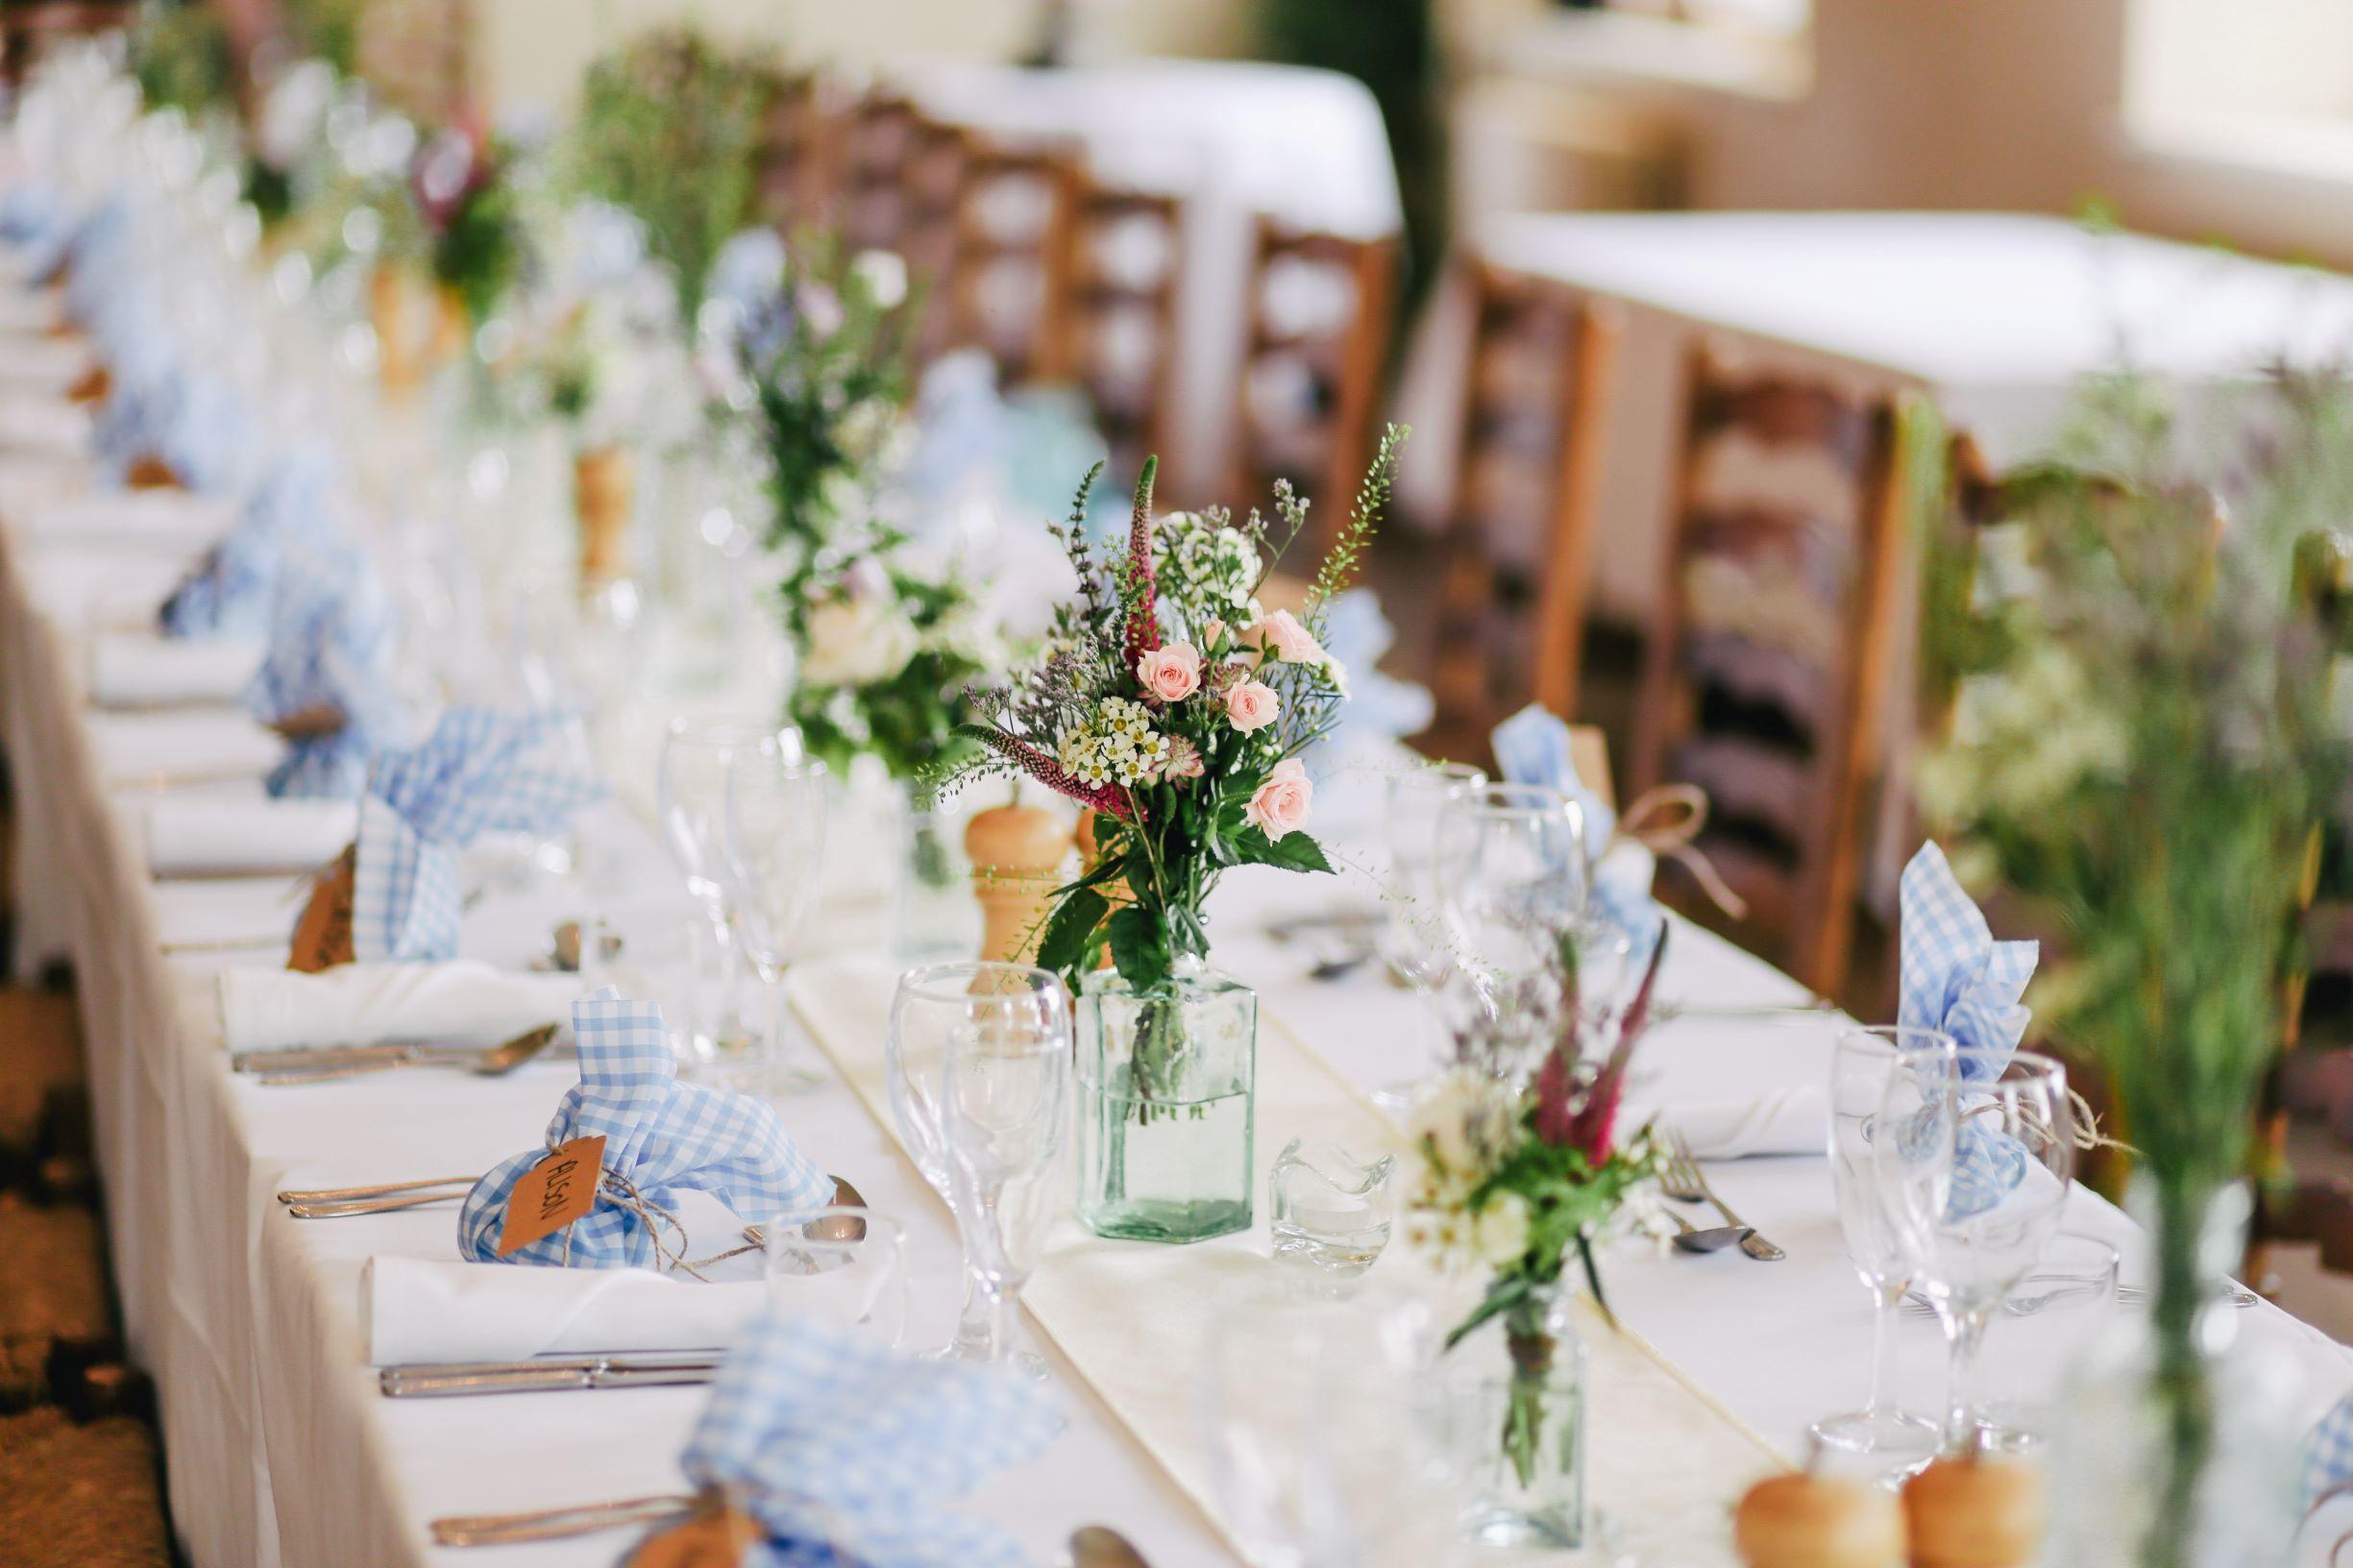 mariage fleurs locales québec champêtre cantons-de-l'est